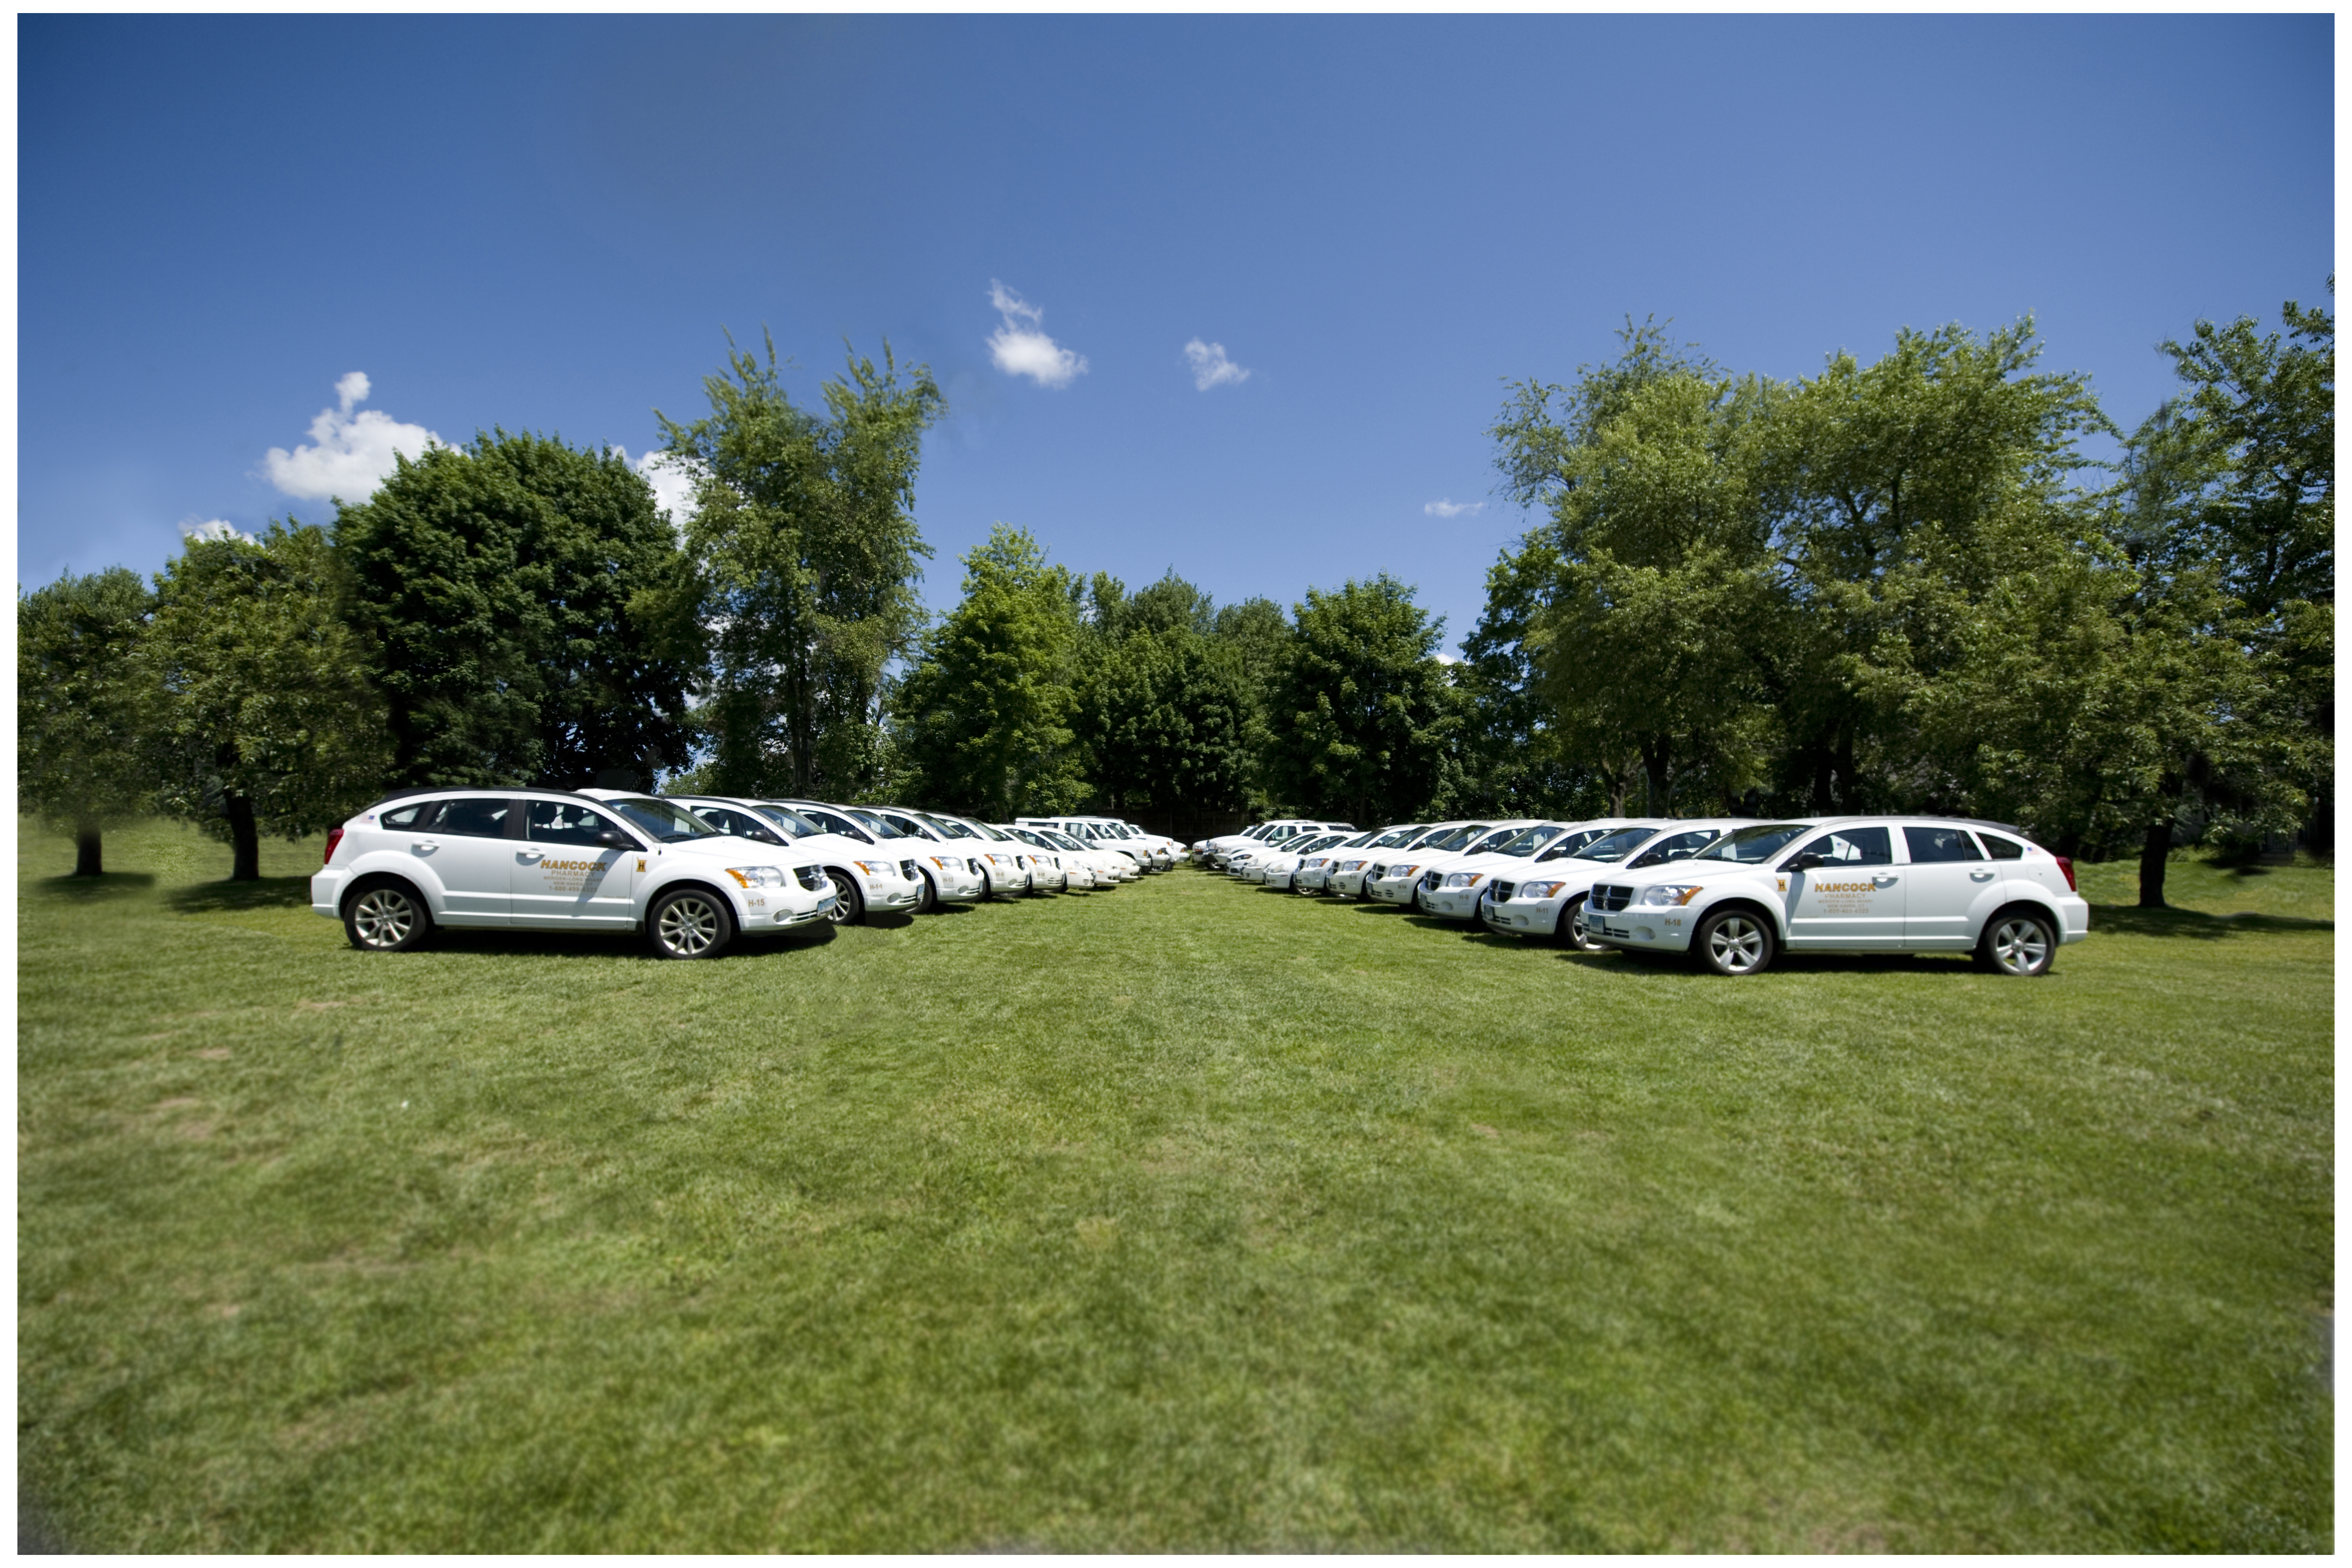 Hancock Pharmacy Fleet of Cars